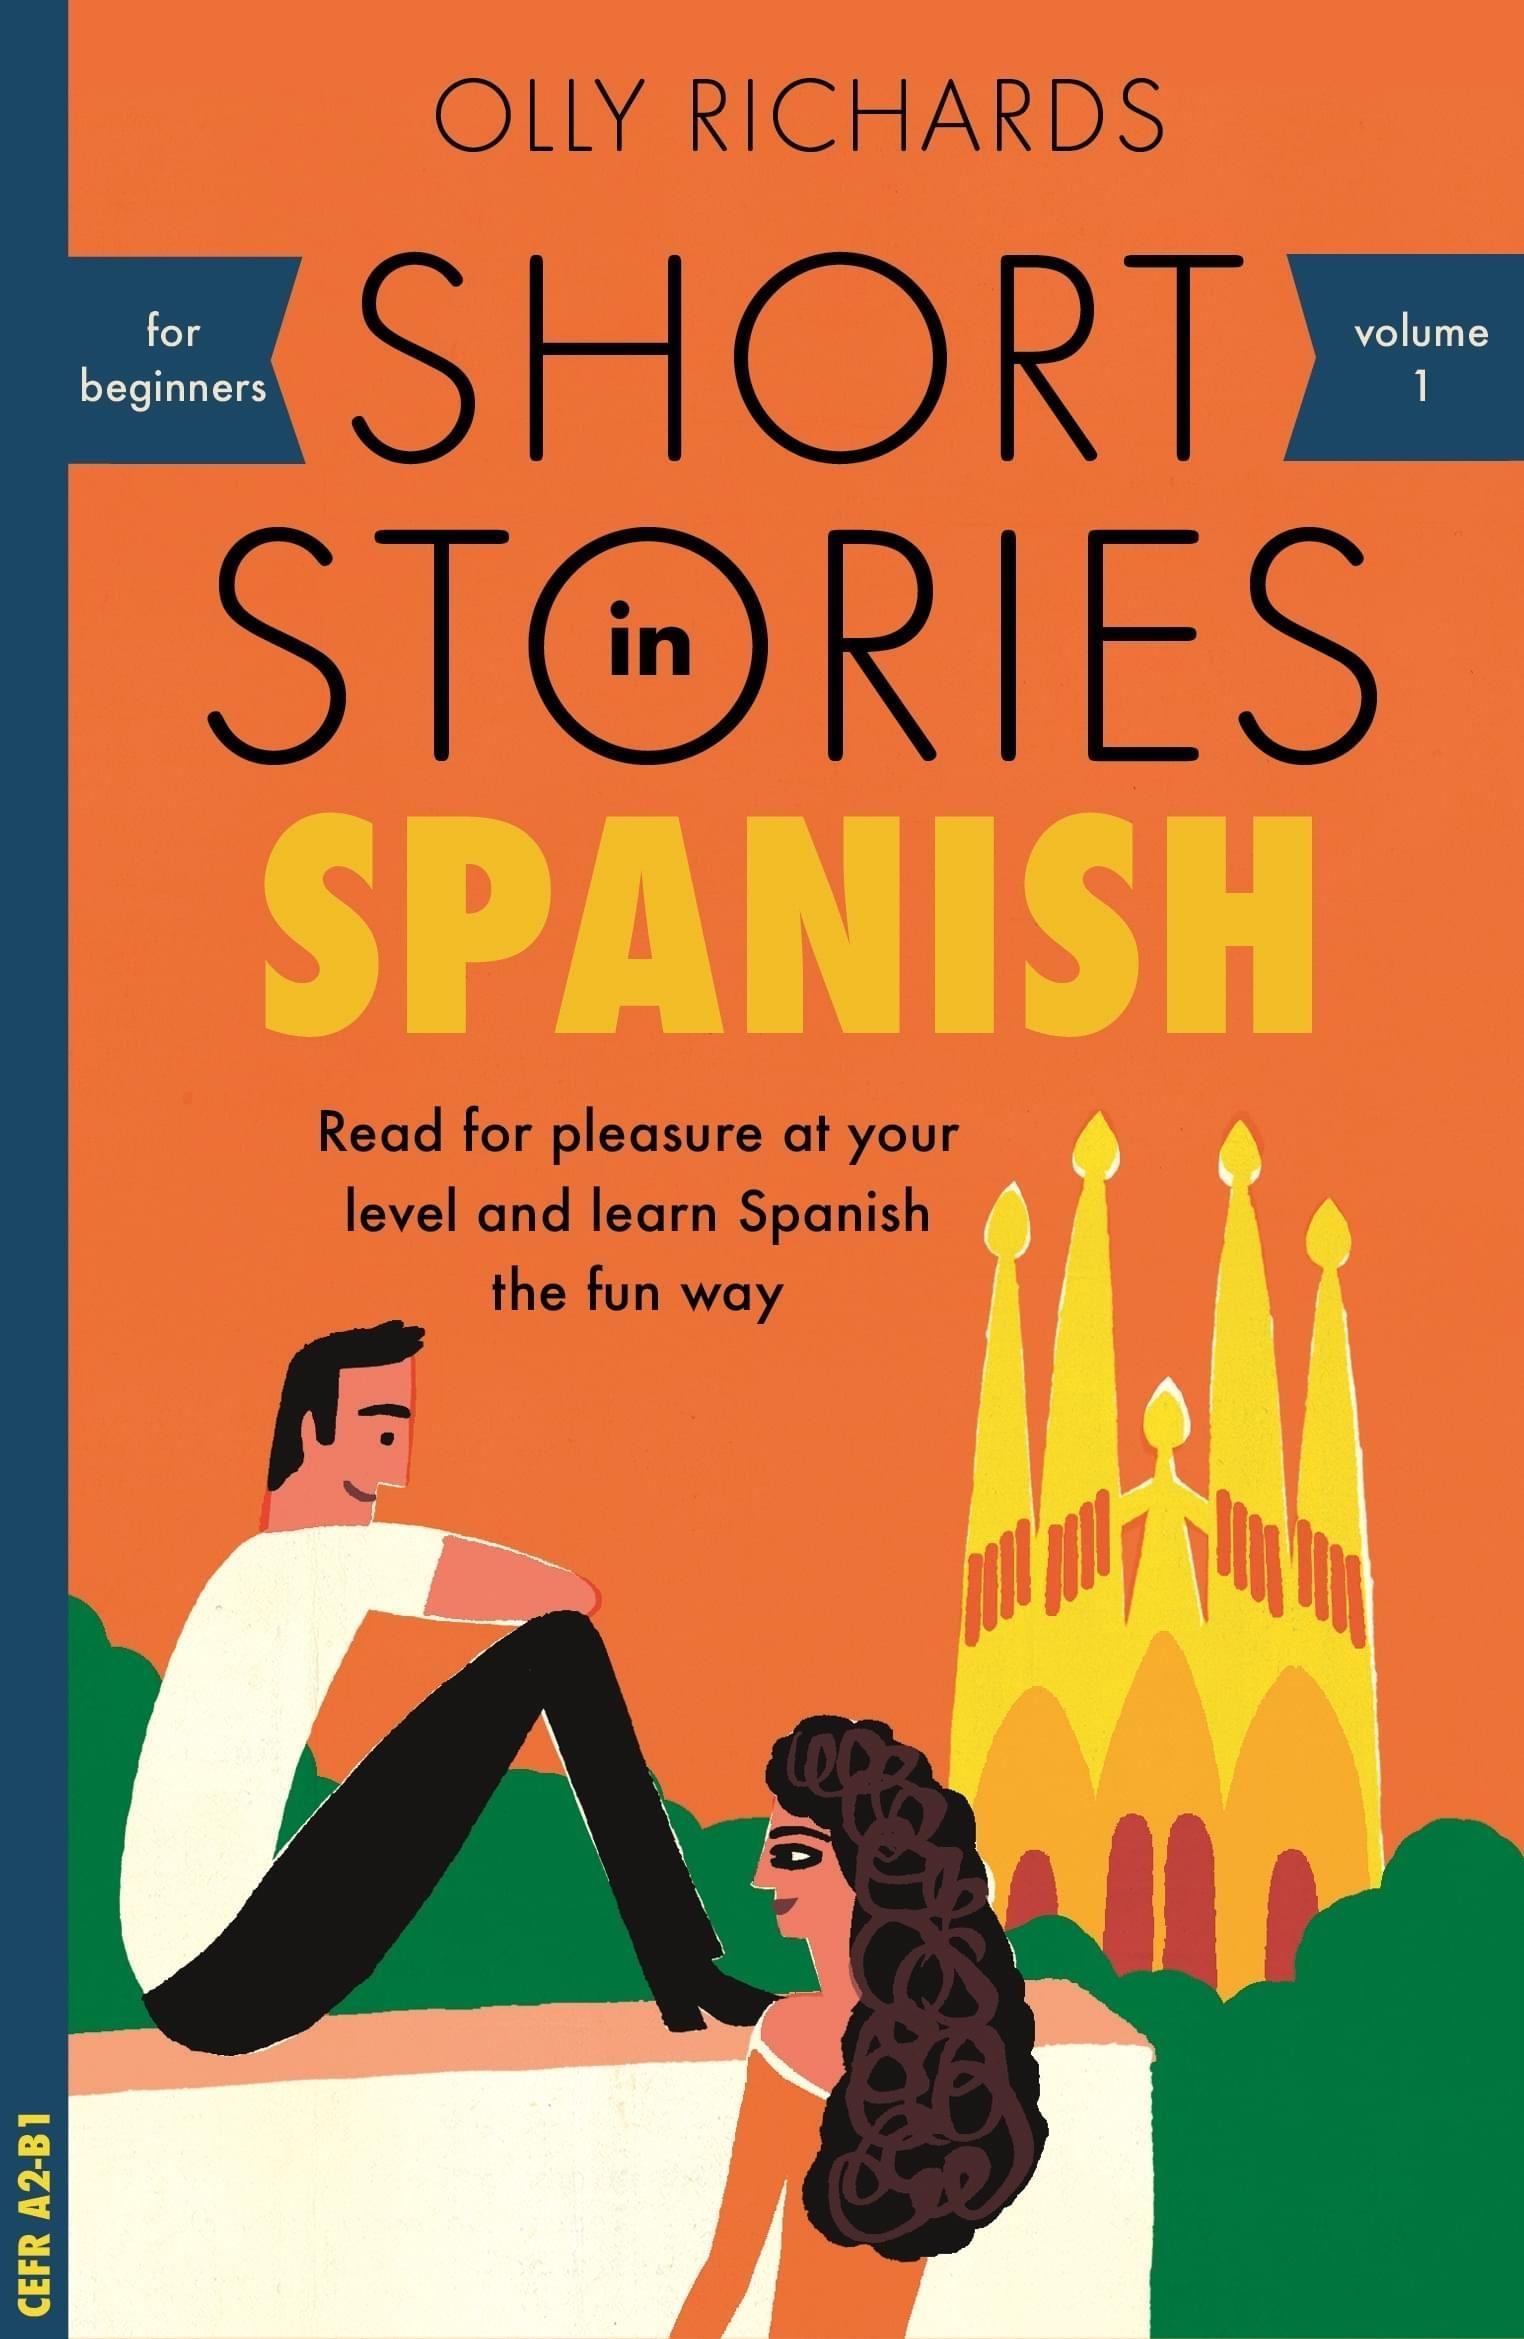 Short Stories For Beginners Olly Richards in 2019